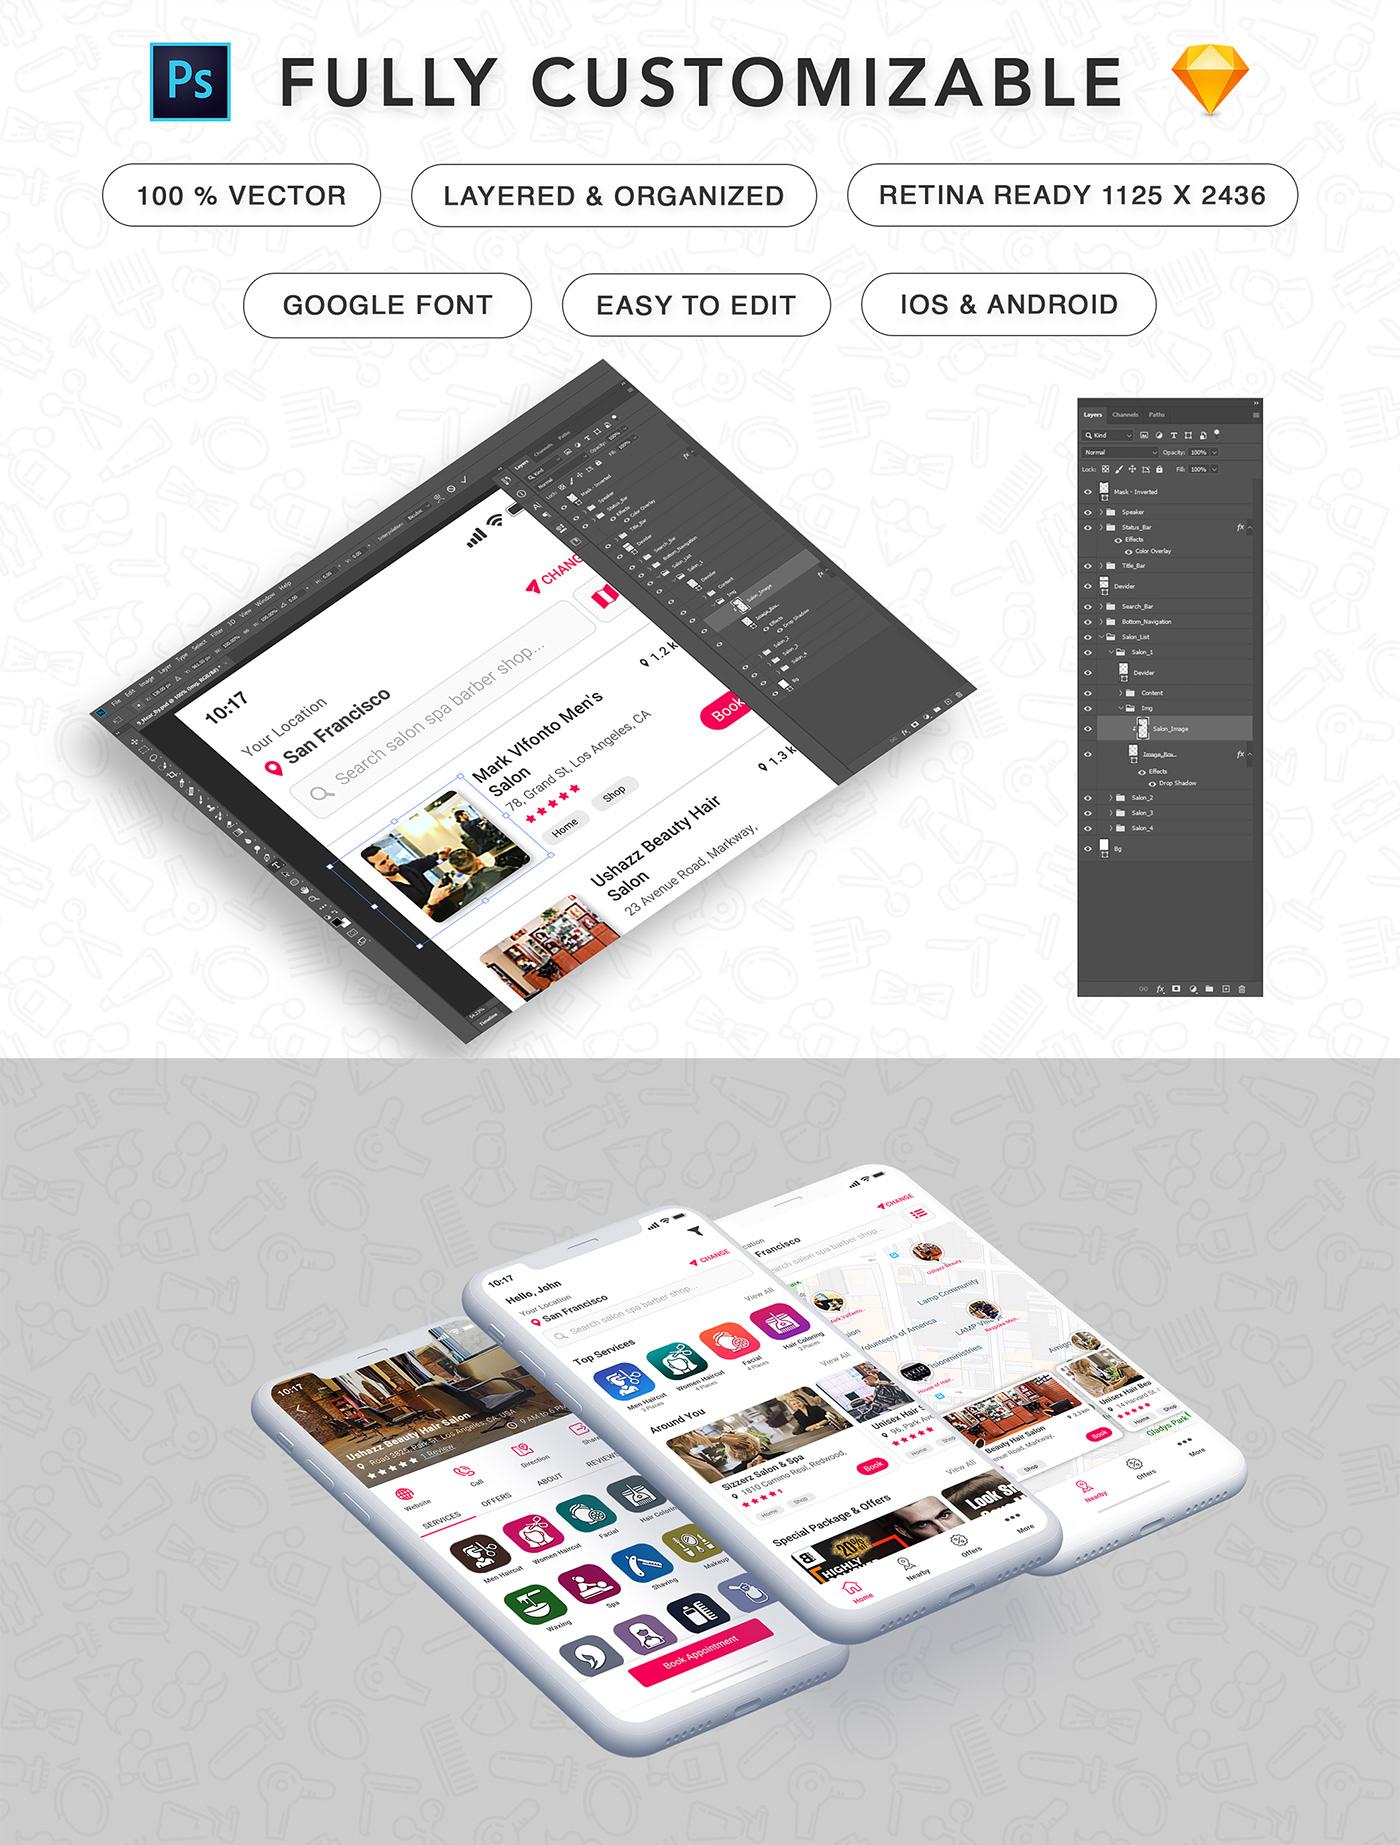 Image may contain: print, screenshot and template